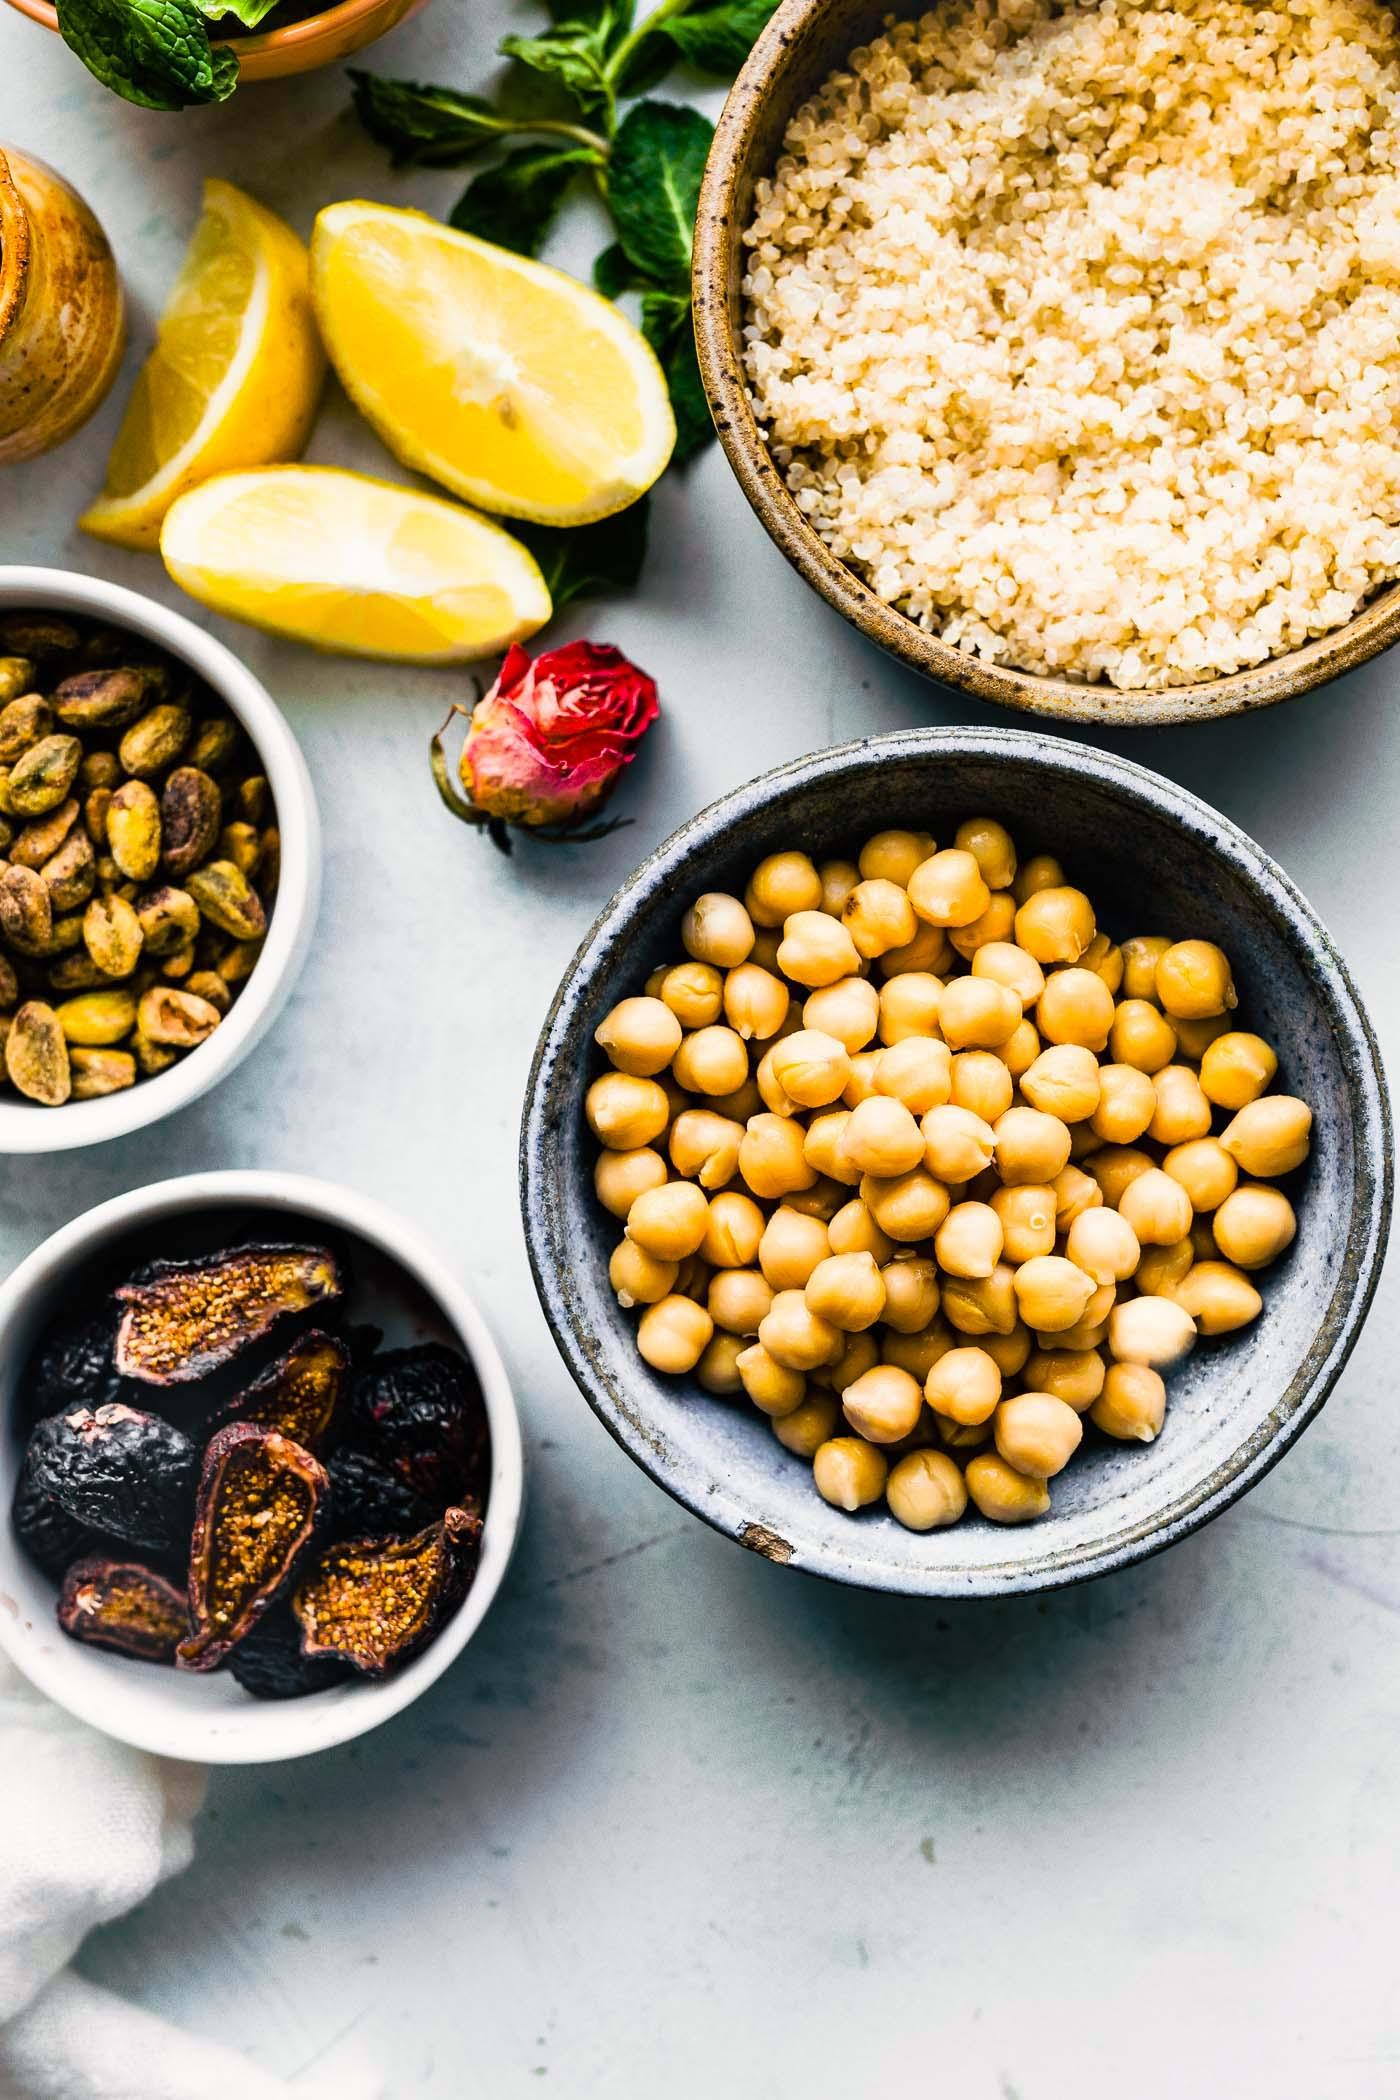 salad ingredients - chickpea and quinoa